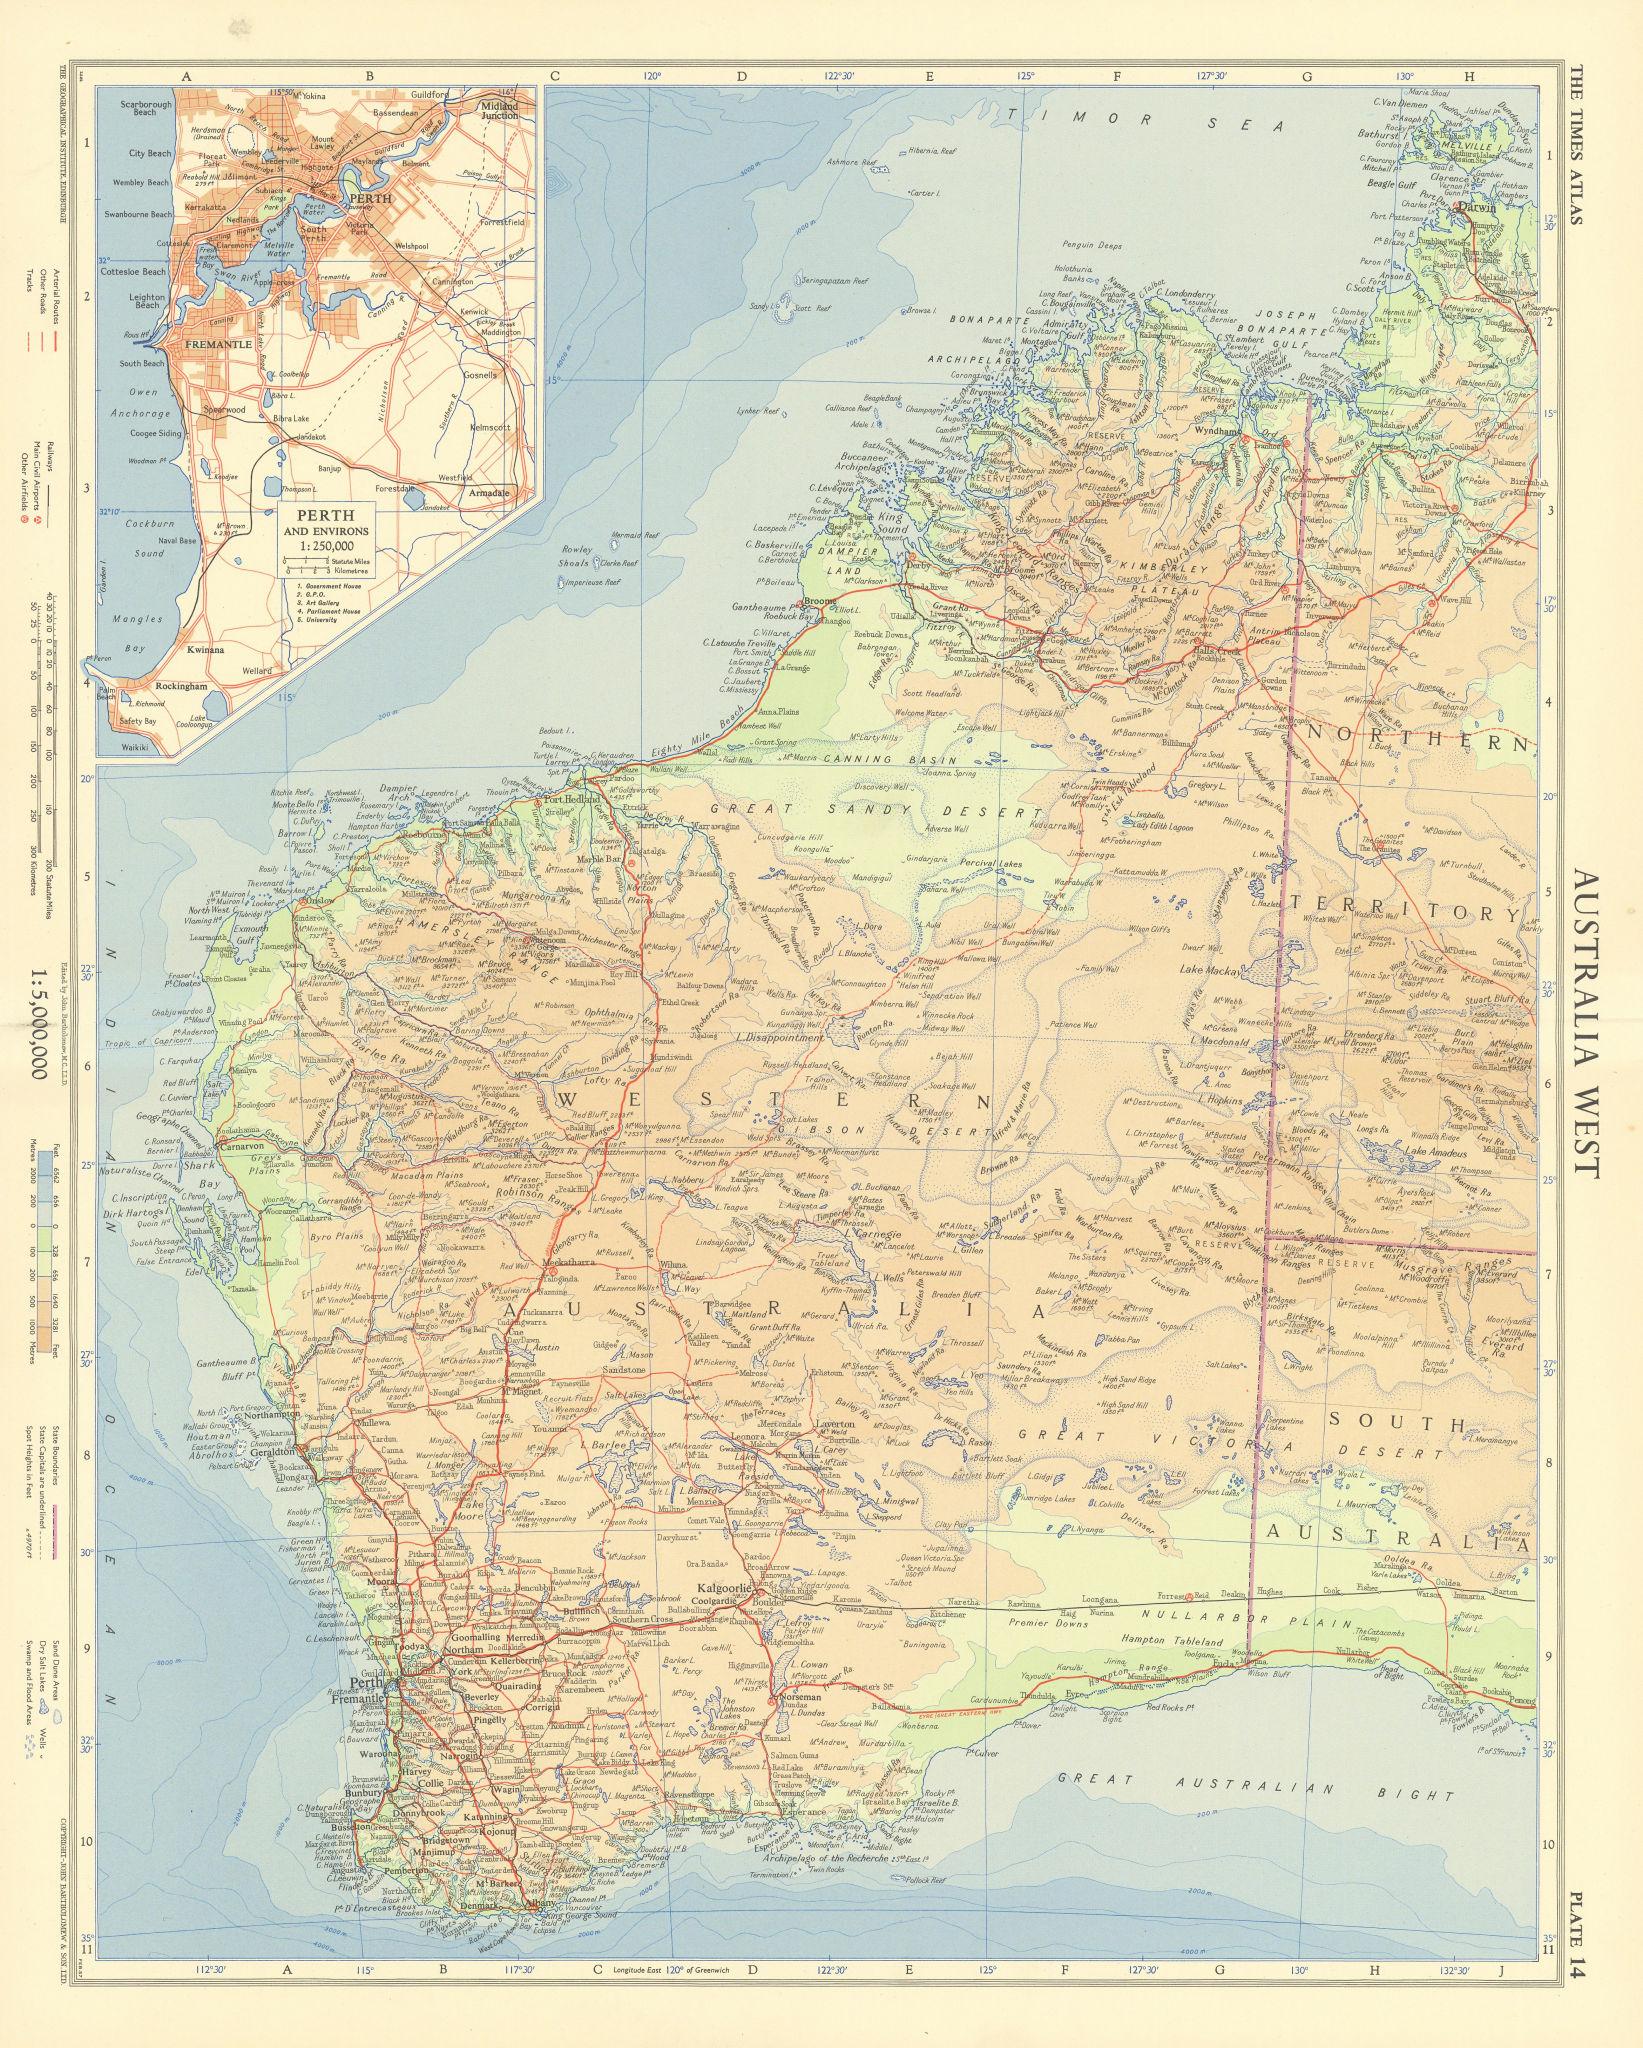 Western Australia. Perth & environs. TIMES 1958 old vintage map plan chart